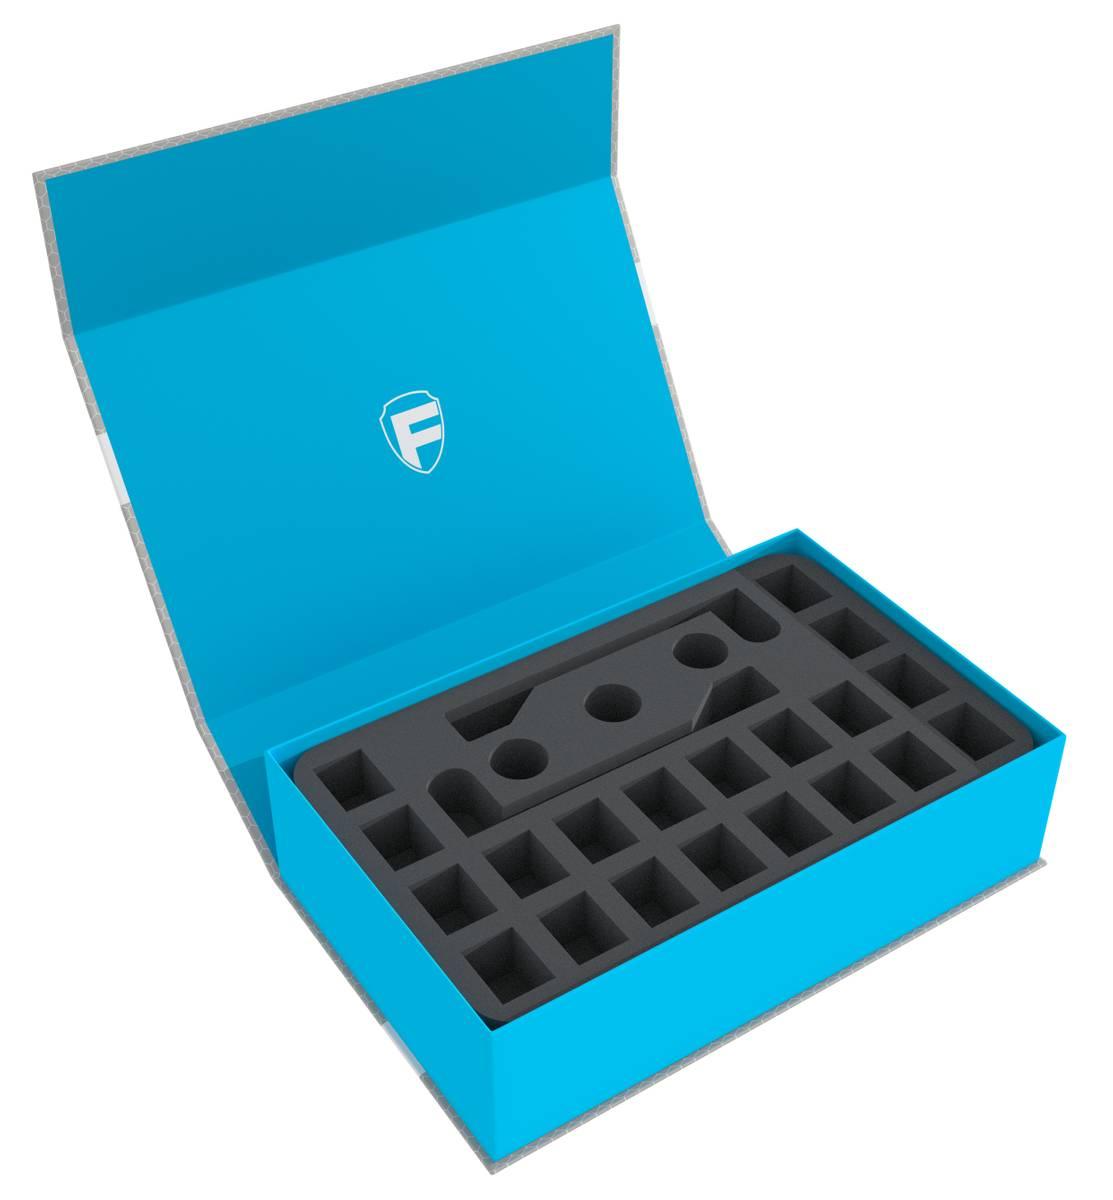 Feldherr Magnetbox blau für Subbuteo - 4 Teams